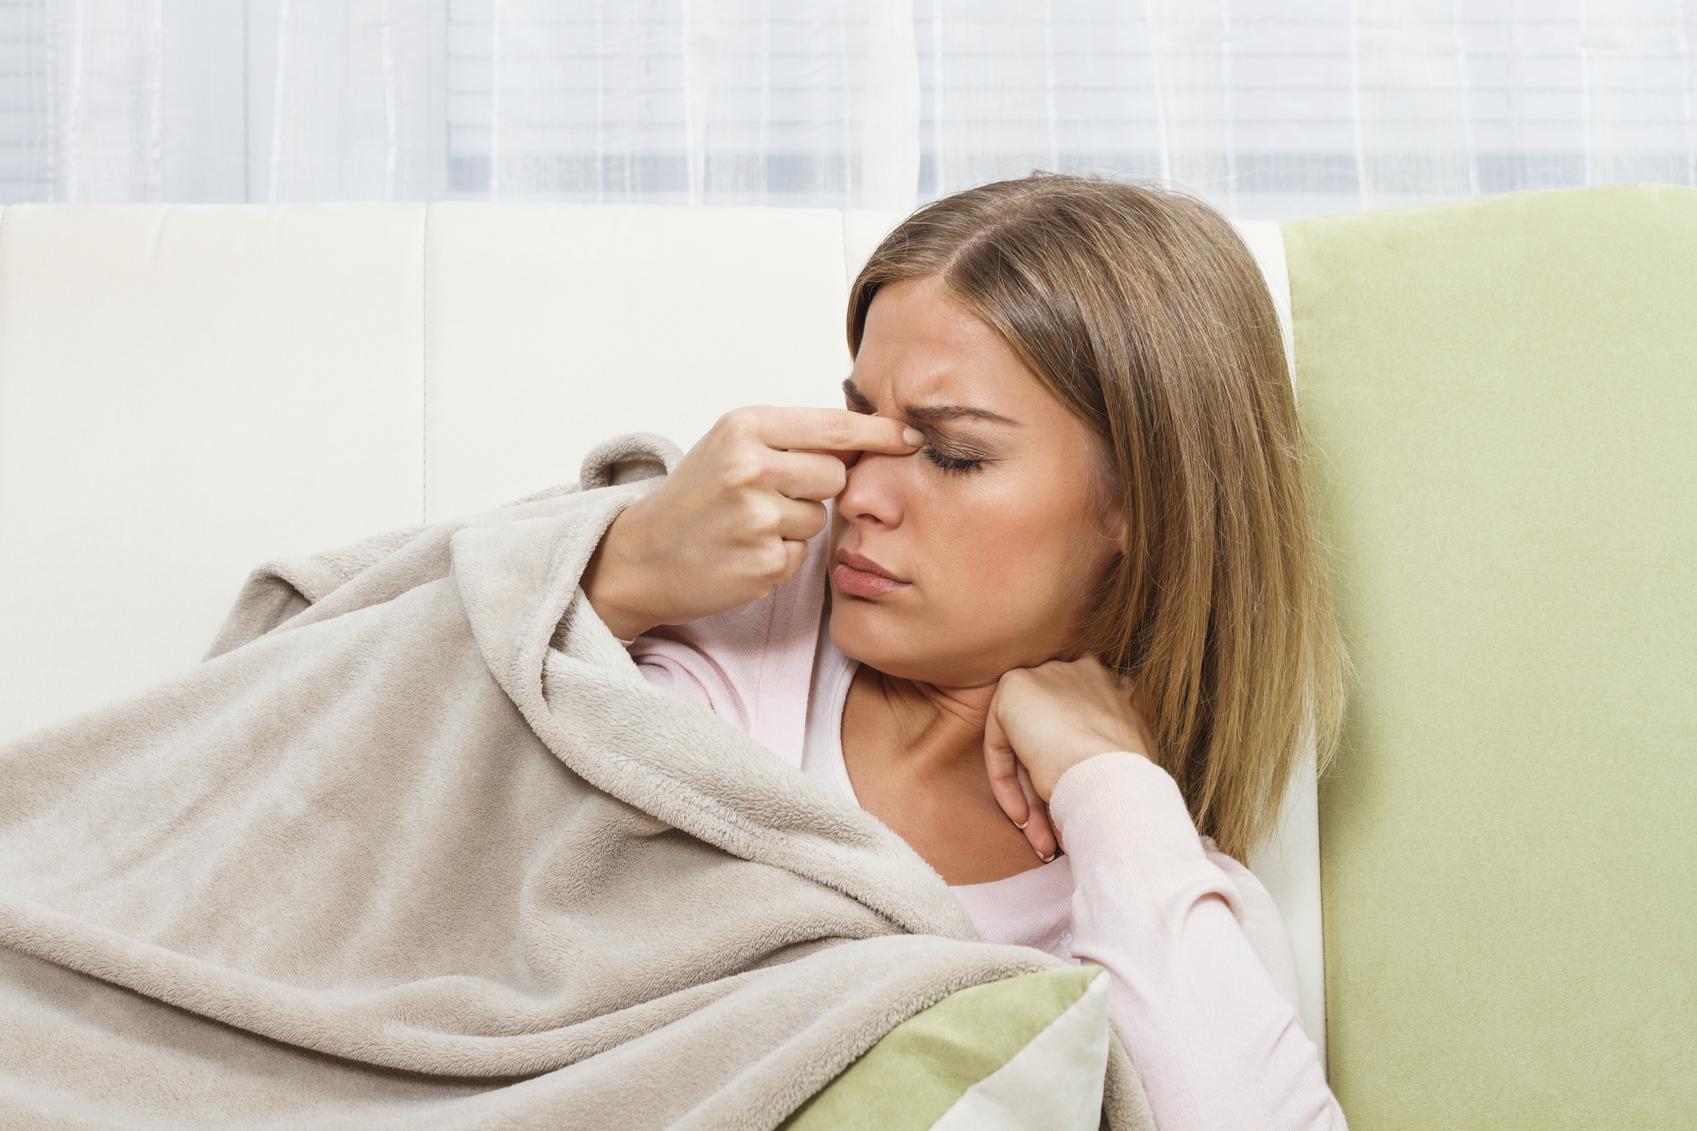 Mujer rubia tumbada se frota los ojos